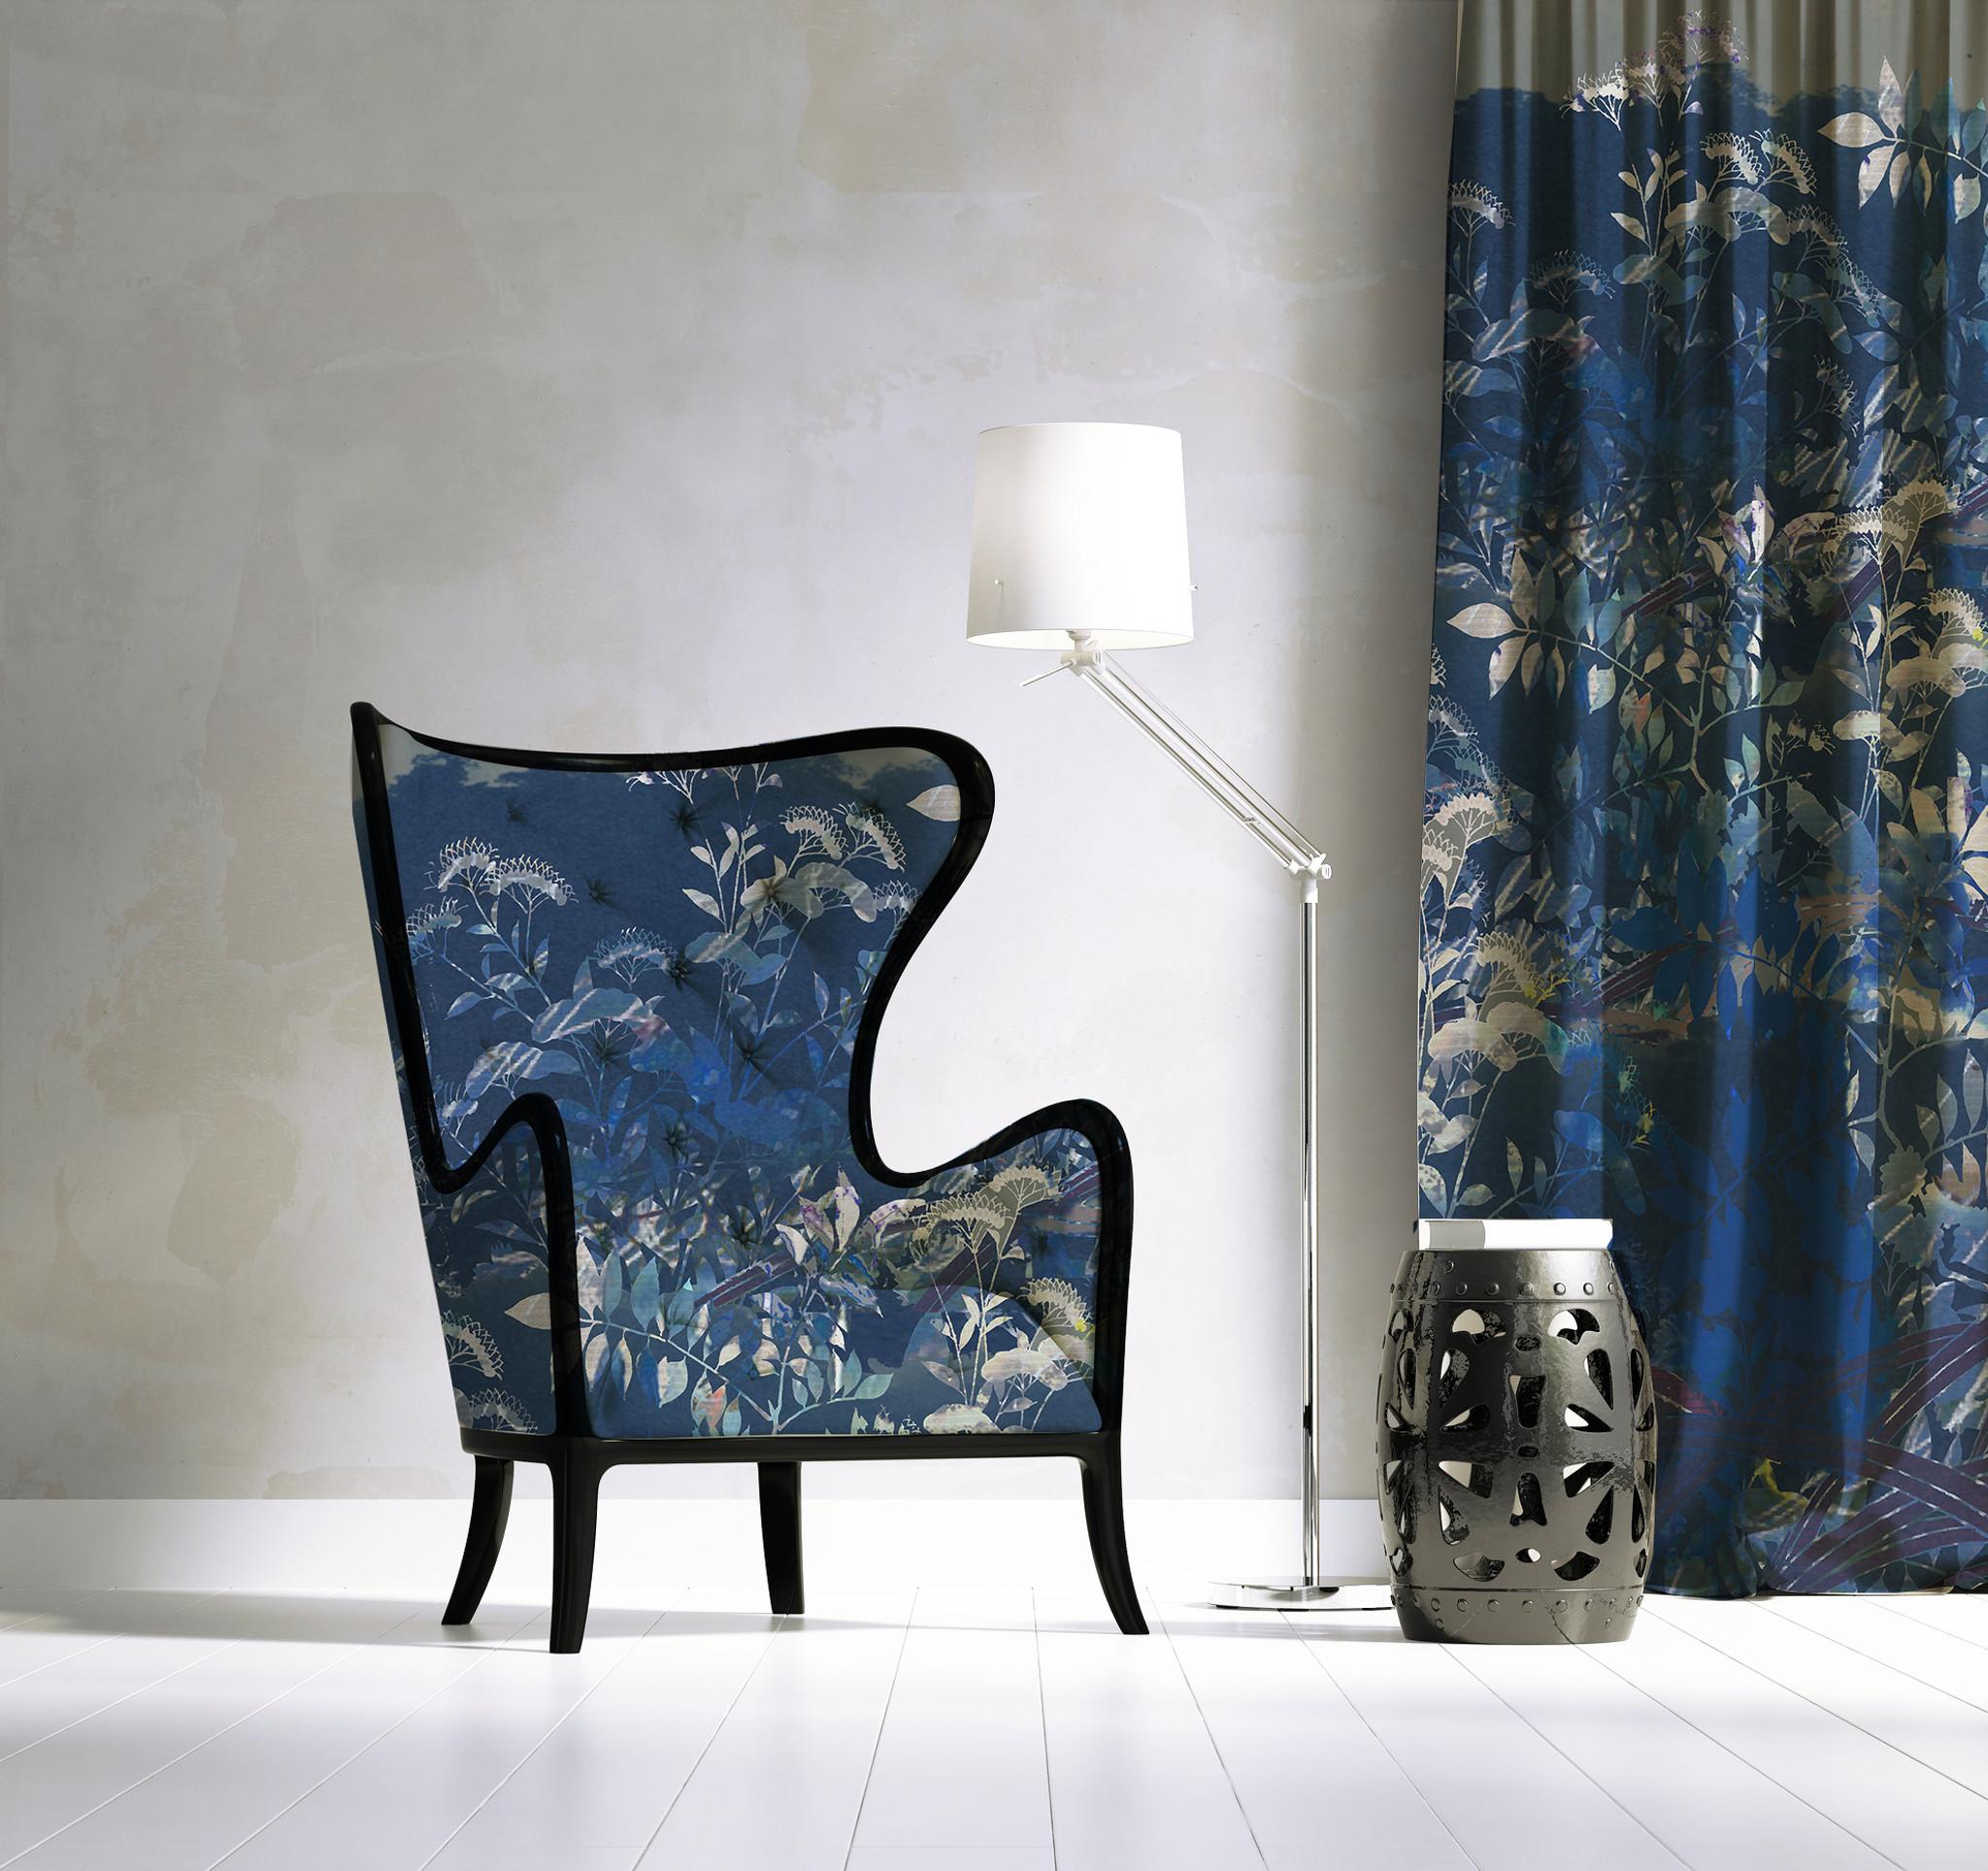 Fabric - Ryokan Dreaming -Suggested Itinerary